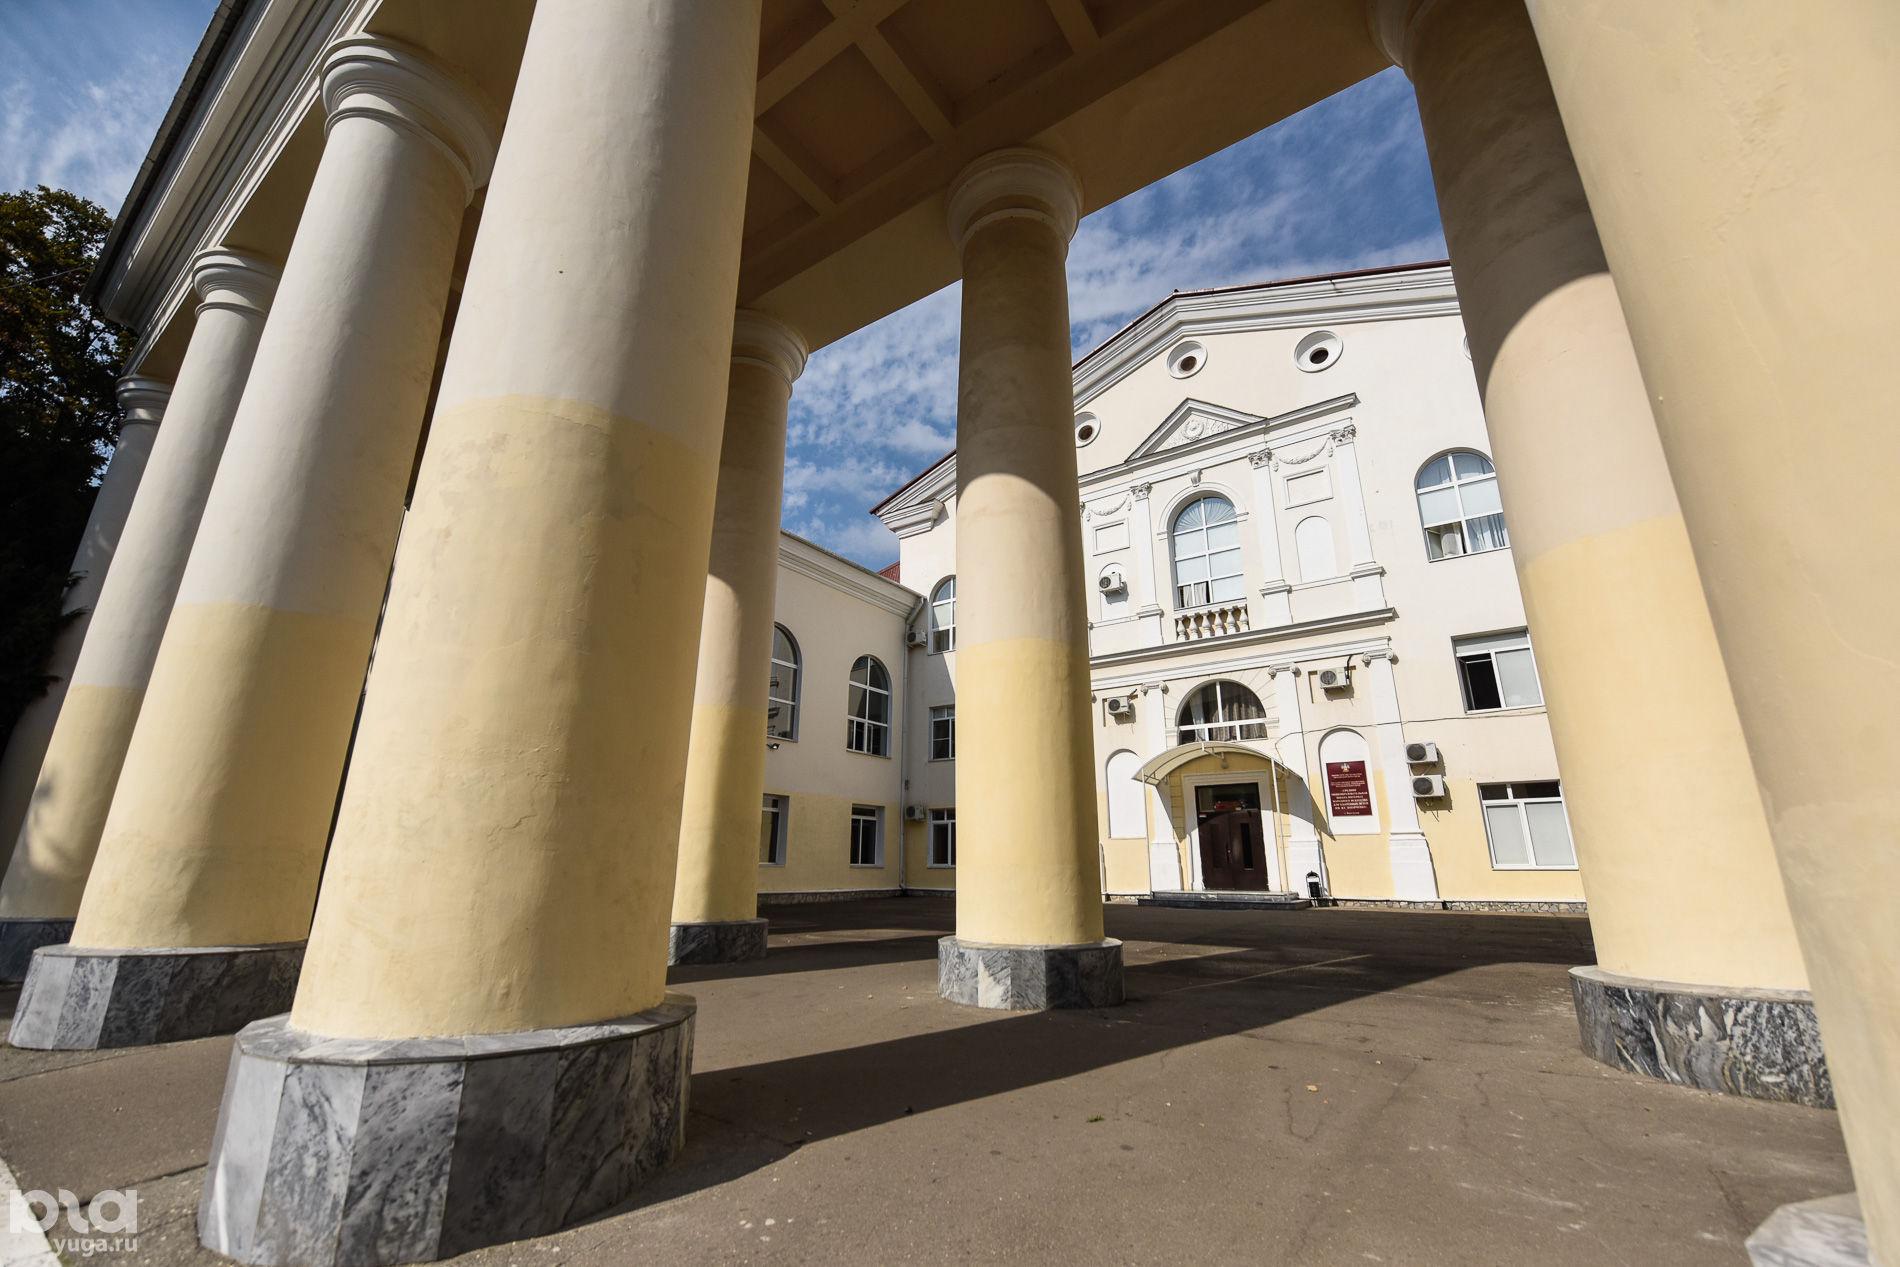 ВКраснодаре произошел пожар вшколе-интернате имени Захарченко